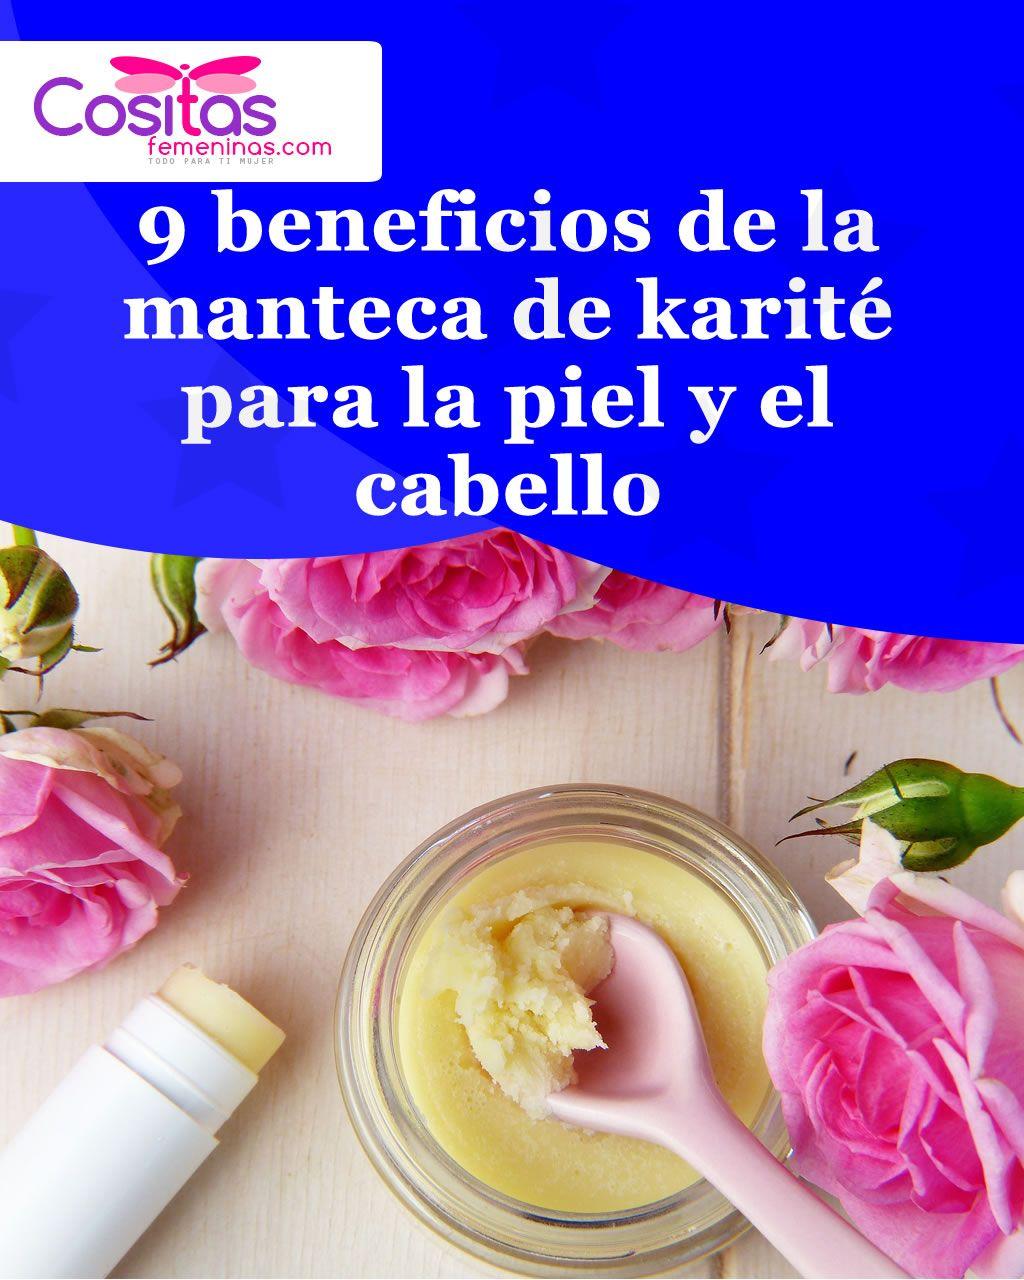 9 Beneficios De La Manteca De Karité Para La Piel Y El Cabello Karite Beneficios Piel Cabello Hand Soap Bottle Hand Soap Soap